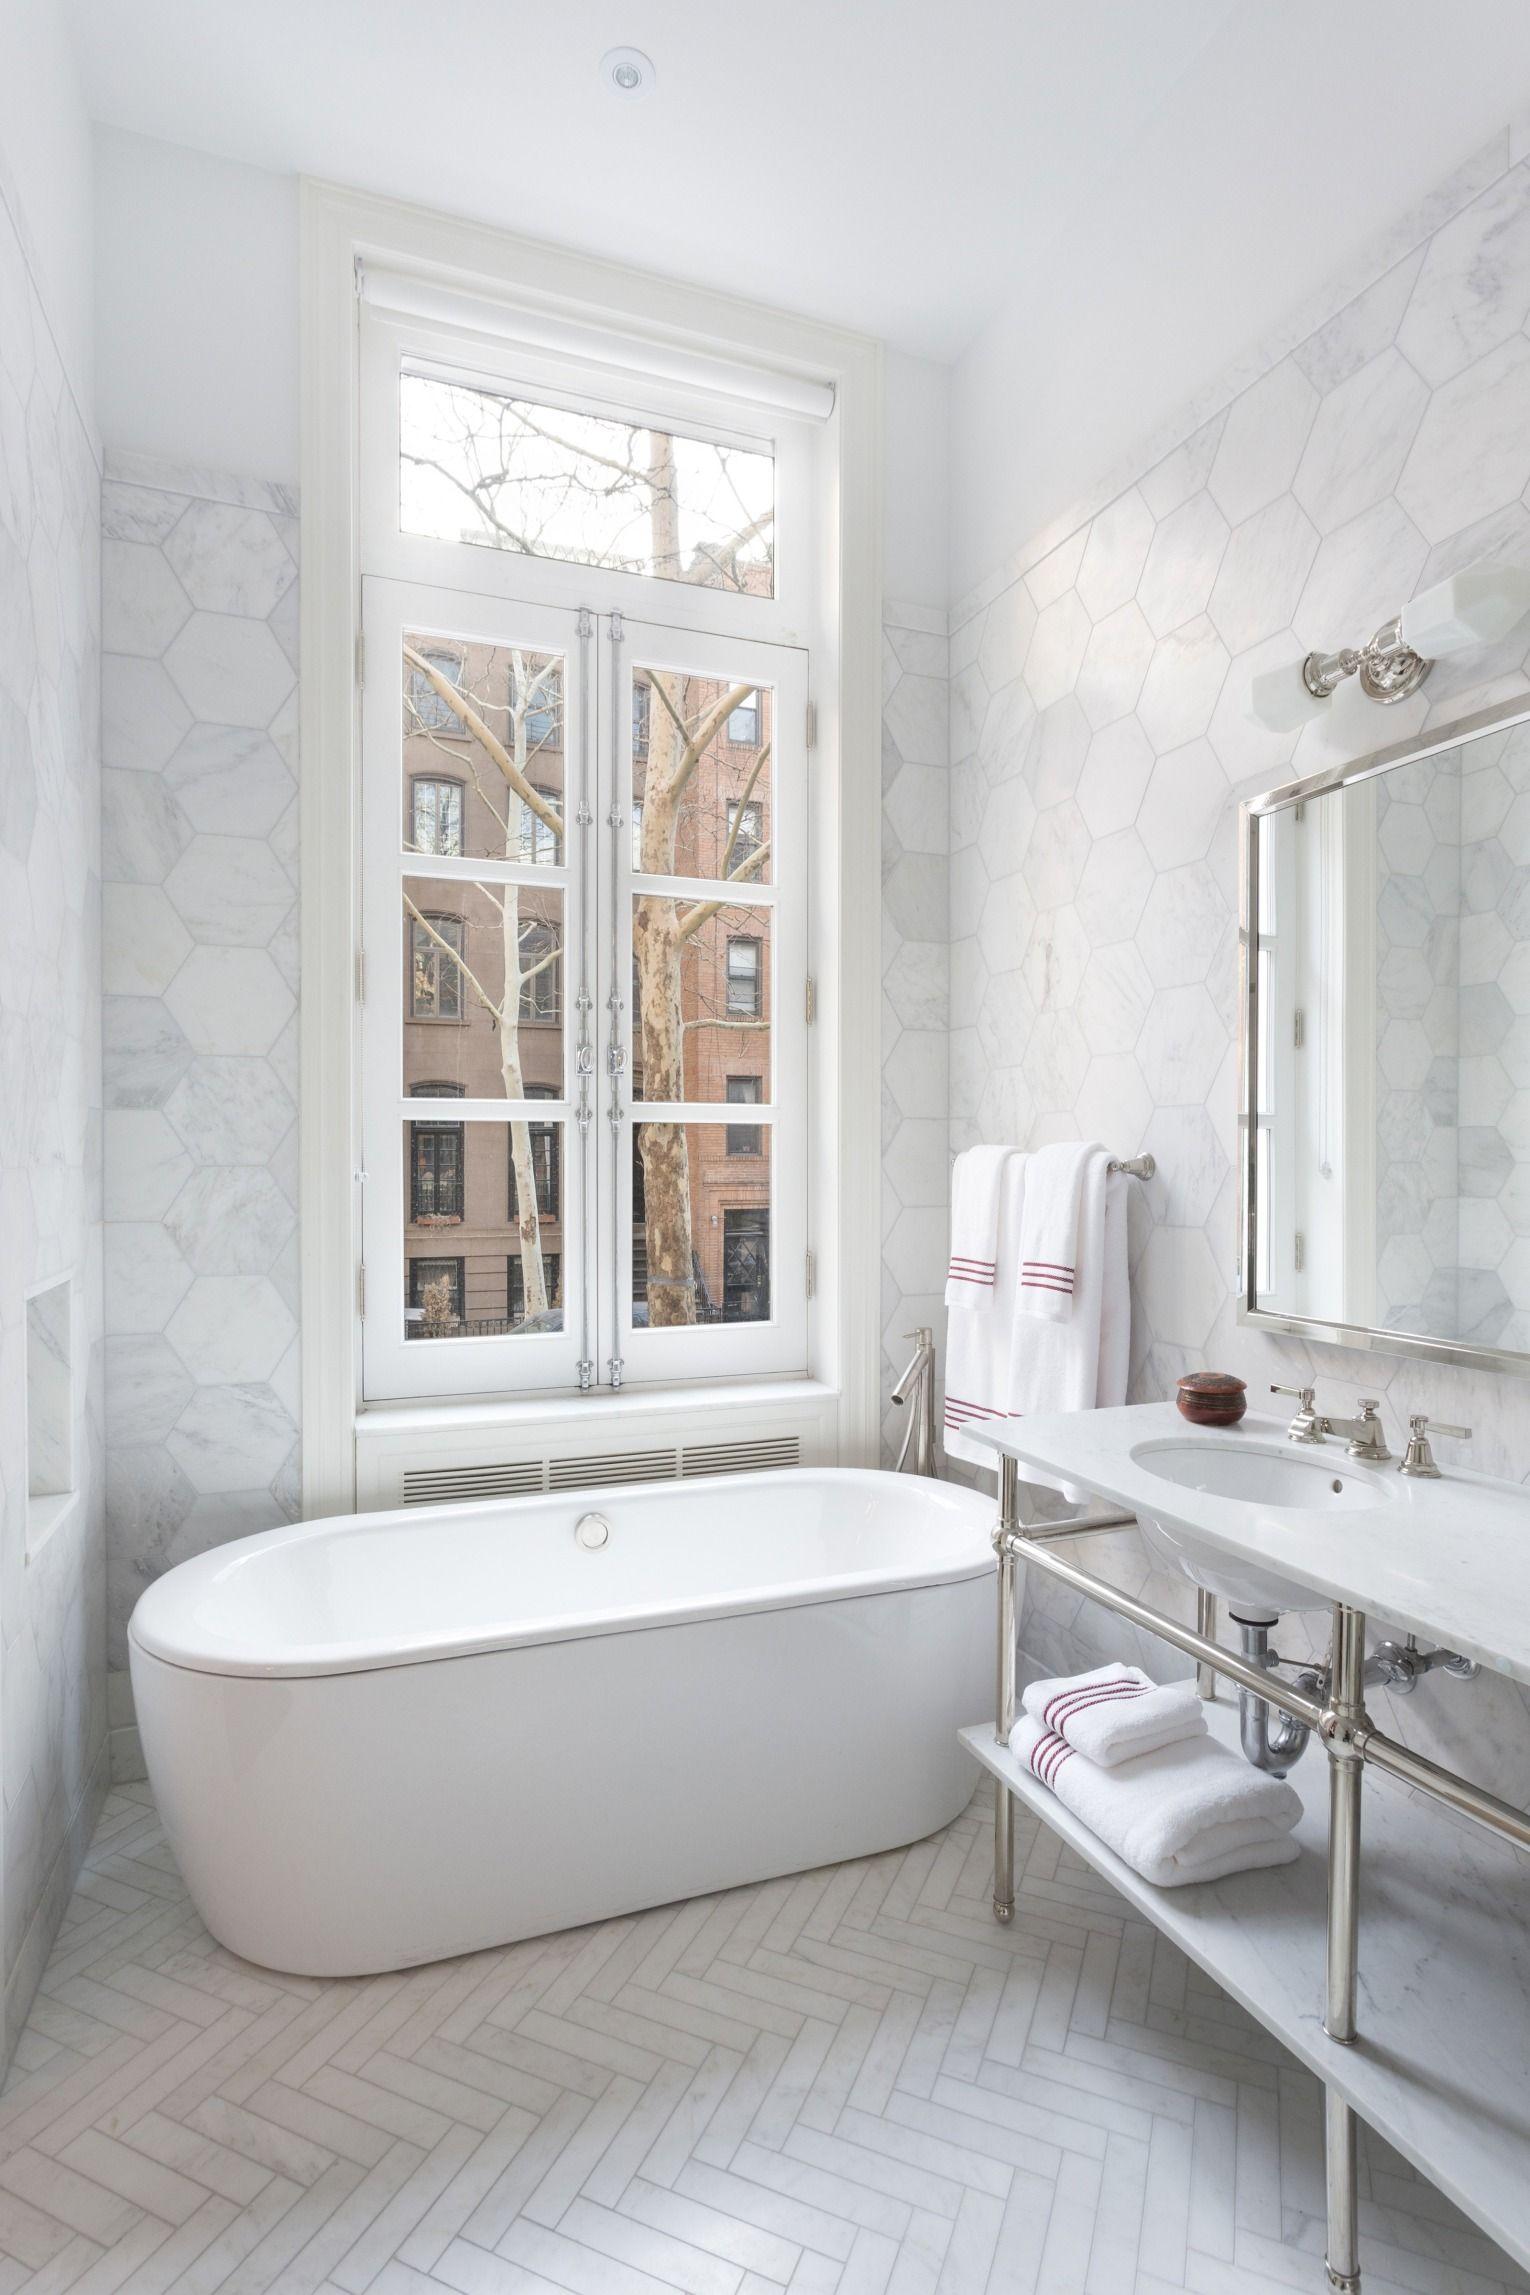 A New York City Couple Remodels Their Small Bath Herringbone Tile Floors Classic Bathroom Hexagon Tile Bathroom